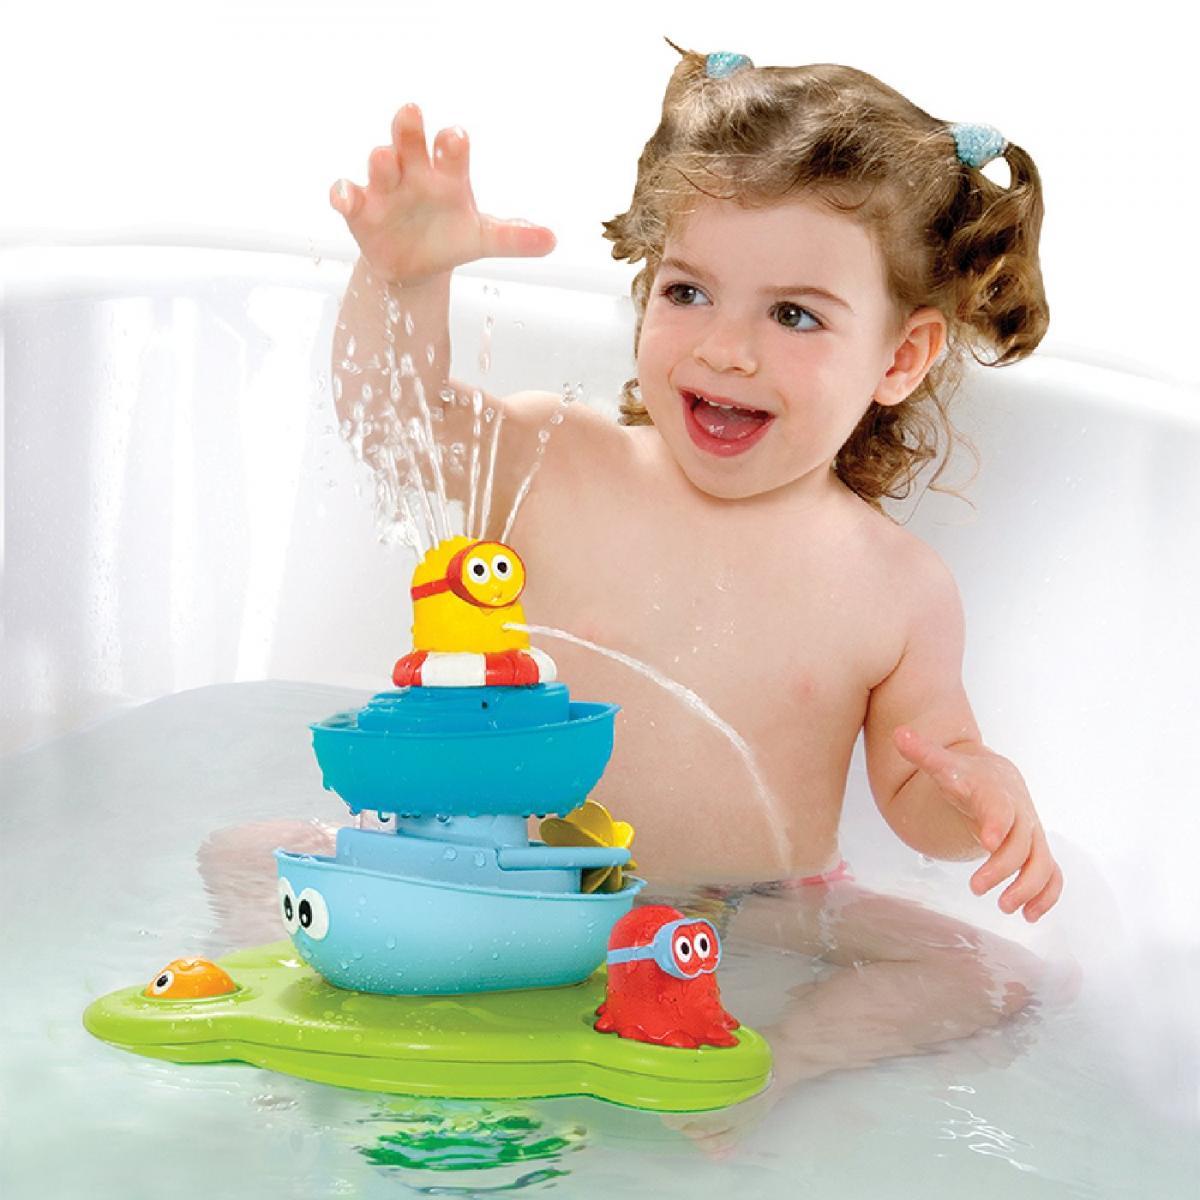 yookidoo magischer brunnen zum selbst aufbauen badespielzeug. Black Bedroom Furniture Sets. Home Design Ideas